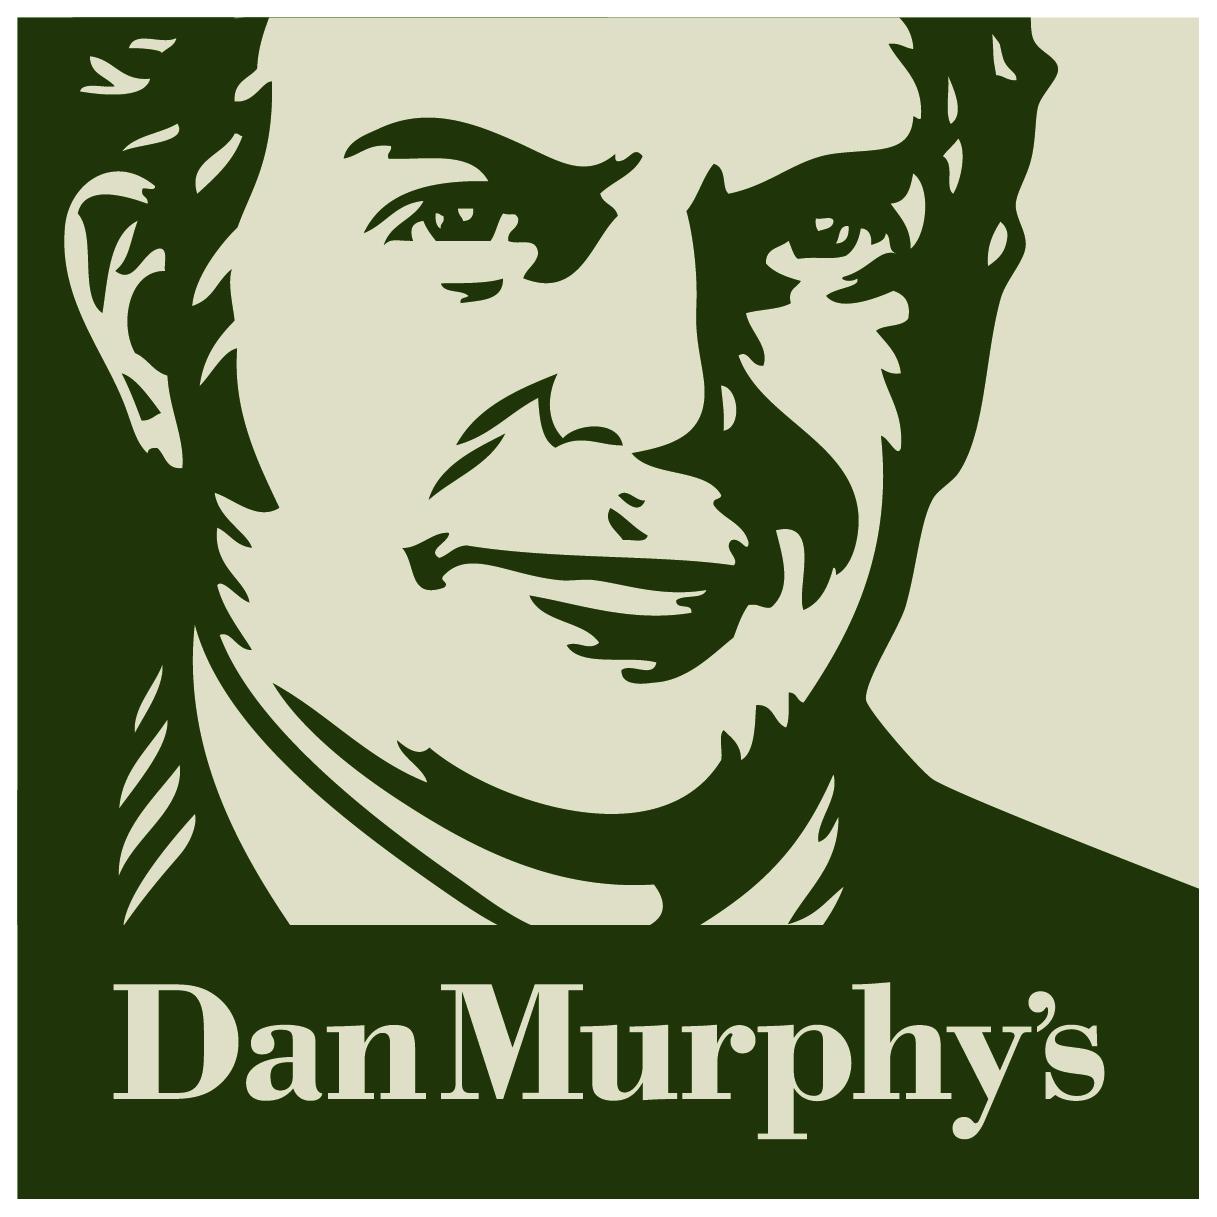 Dan Murphys_Logo Lockup_2015_SQR_PRINT_KEYLINE.jpg